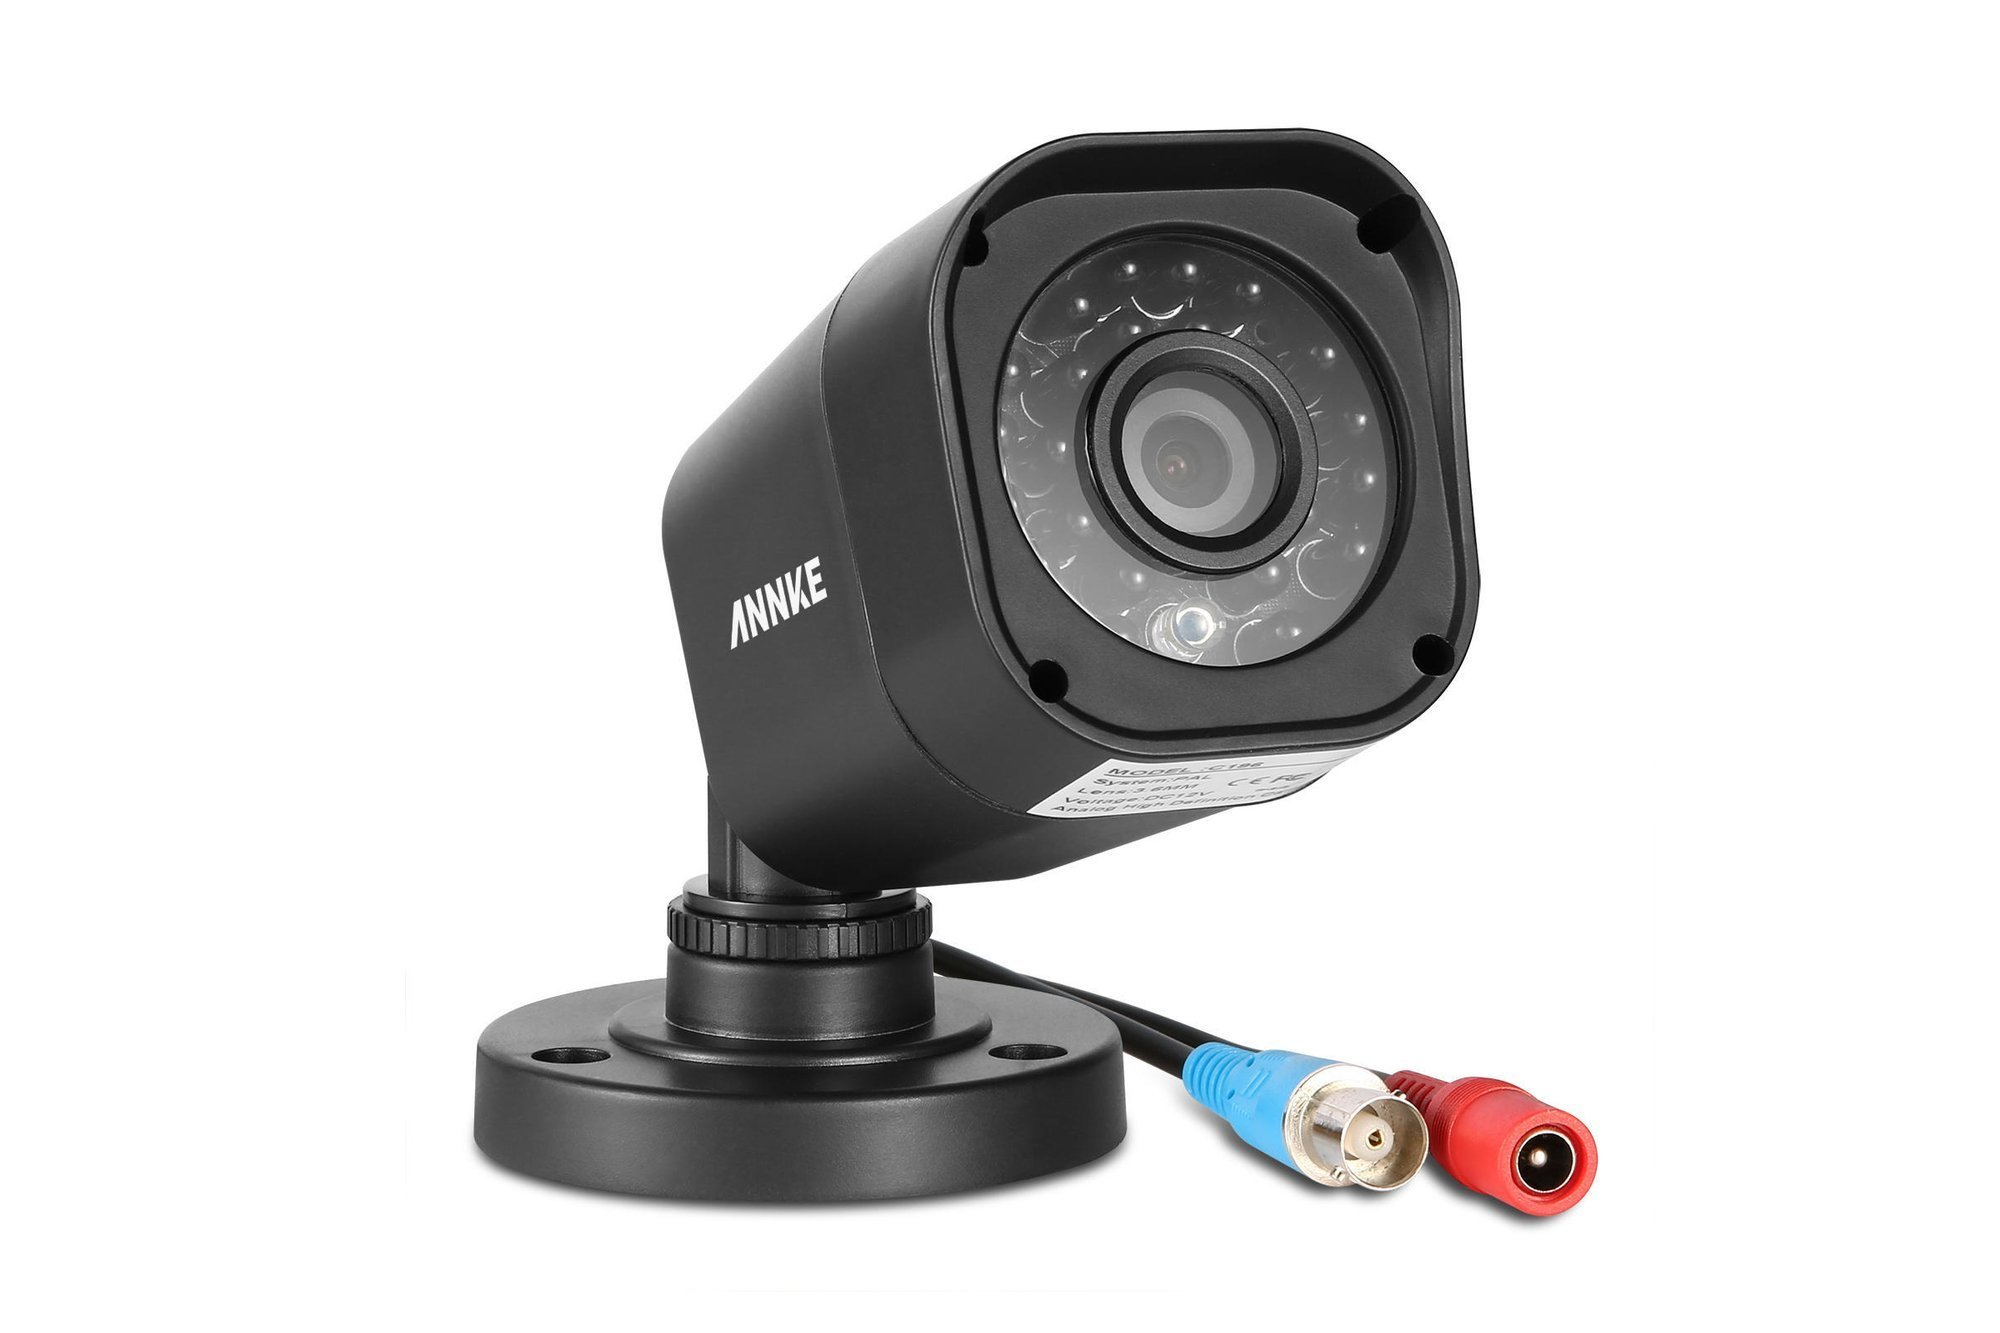 Annke C11BX 720P IR TVI CCTV HD Surveillance camera